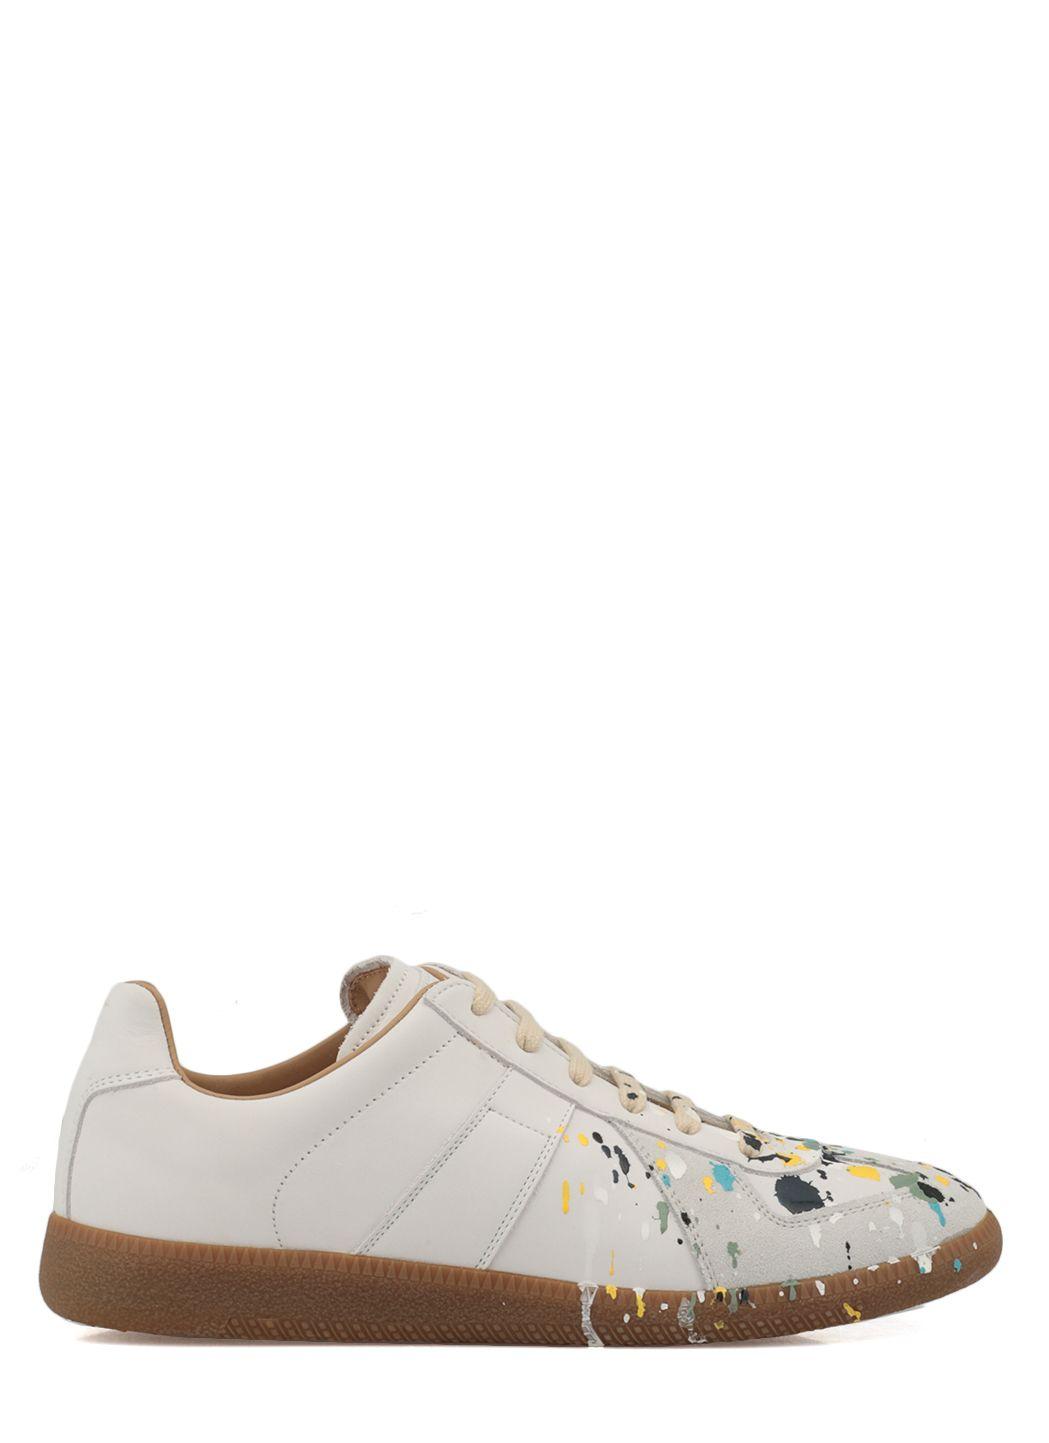 Sneaker con stampa